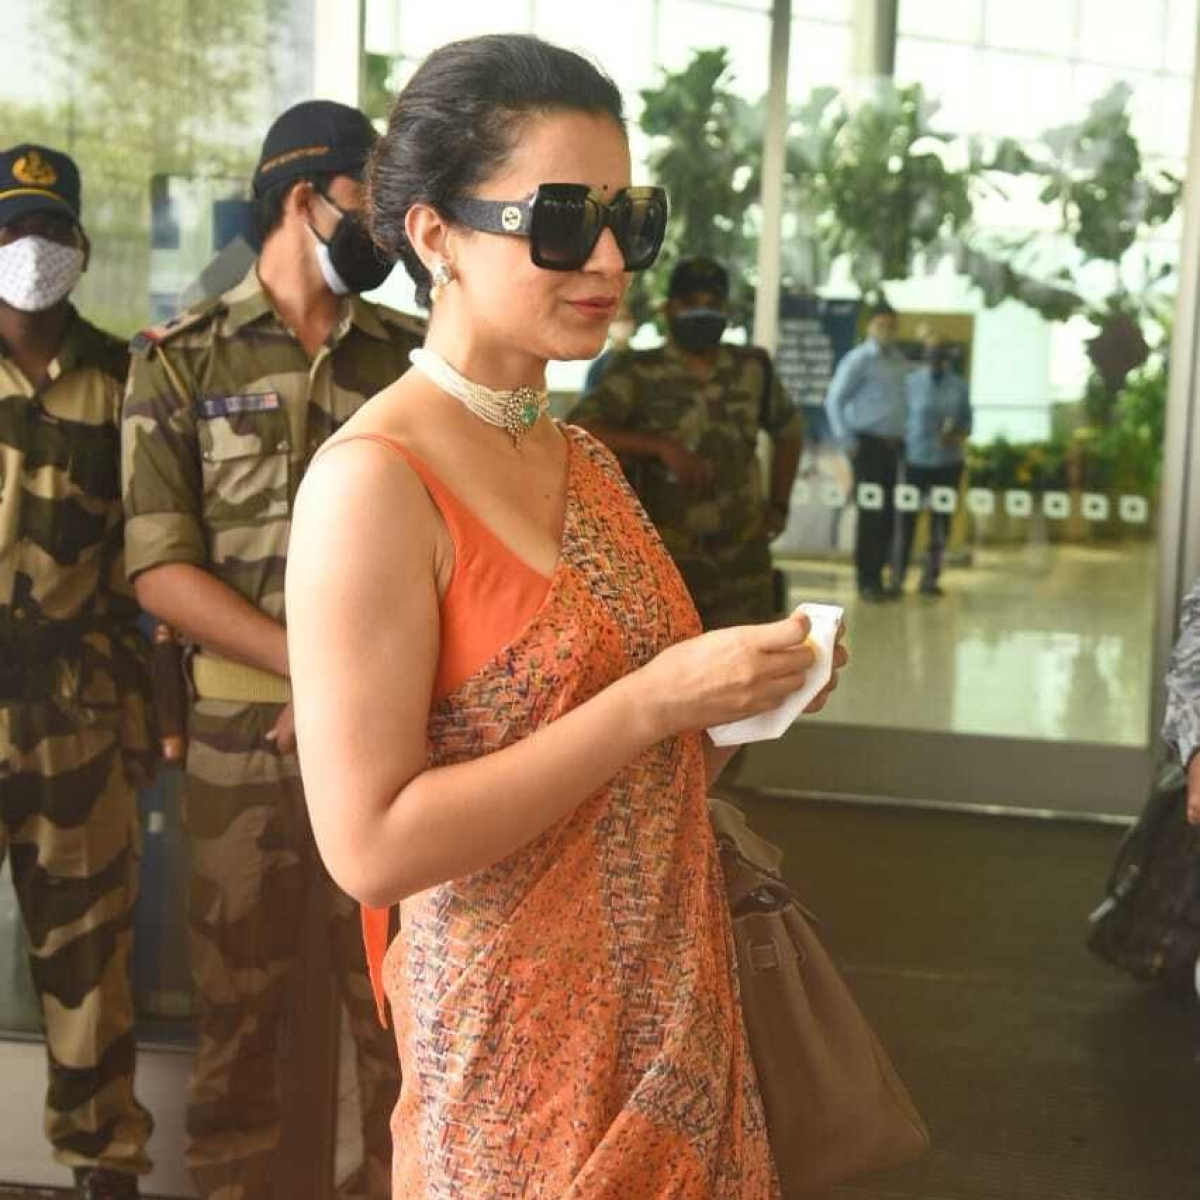 'Kis kis ko corona ho gaya?': Watch Kangana Ranaut check on paps as she leaves for Manali post COVID-19 recovery